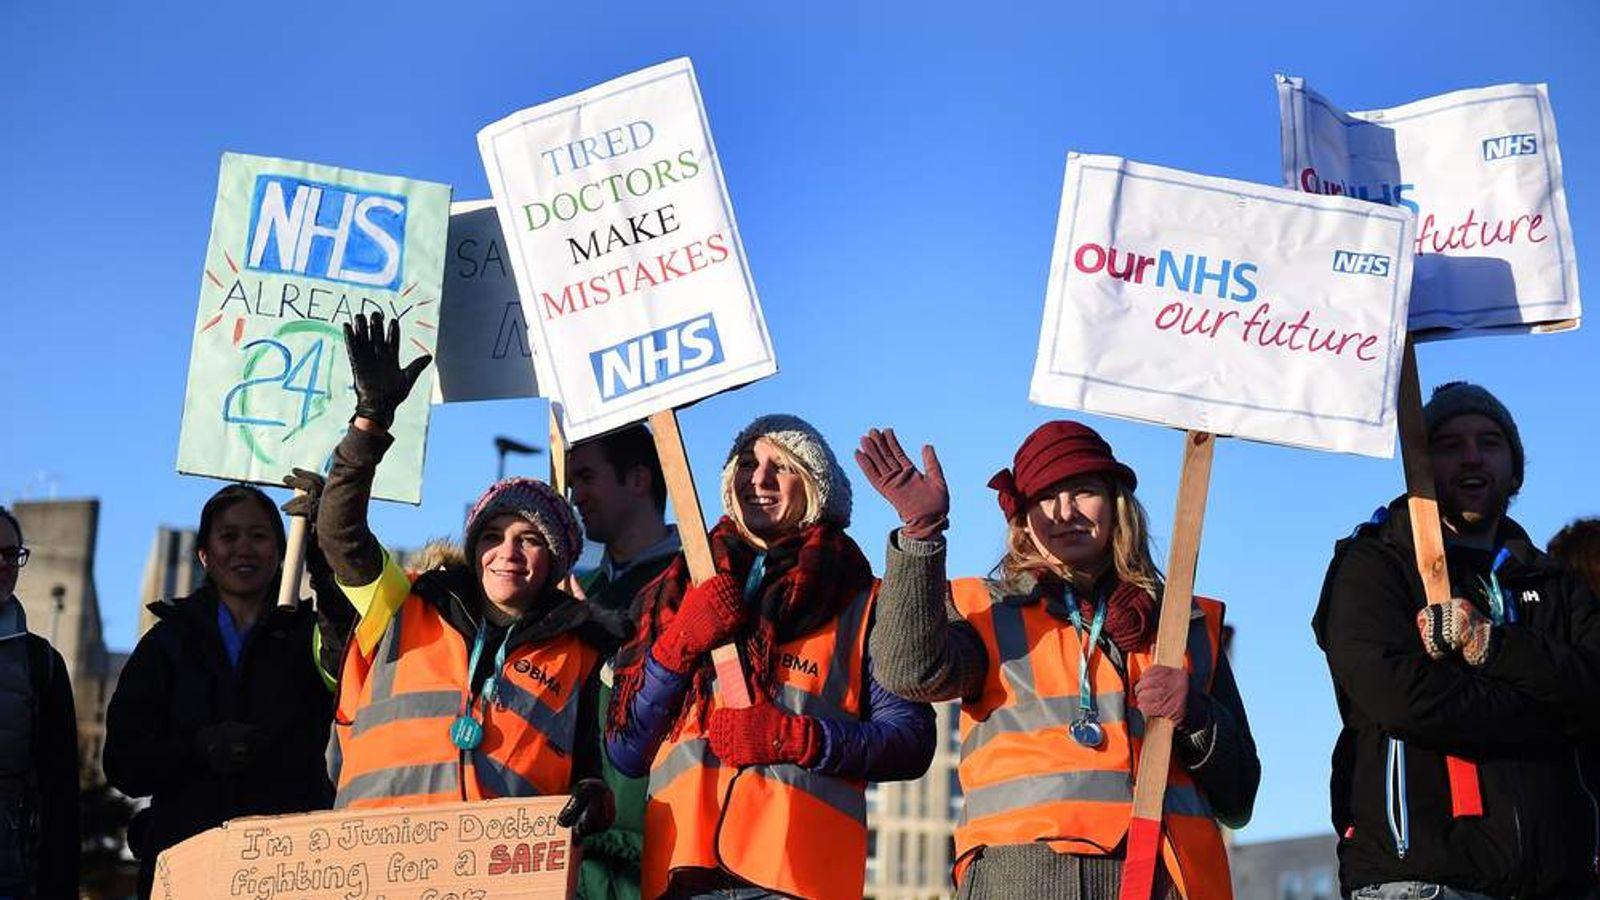 Dispute over doctors' contracts